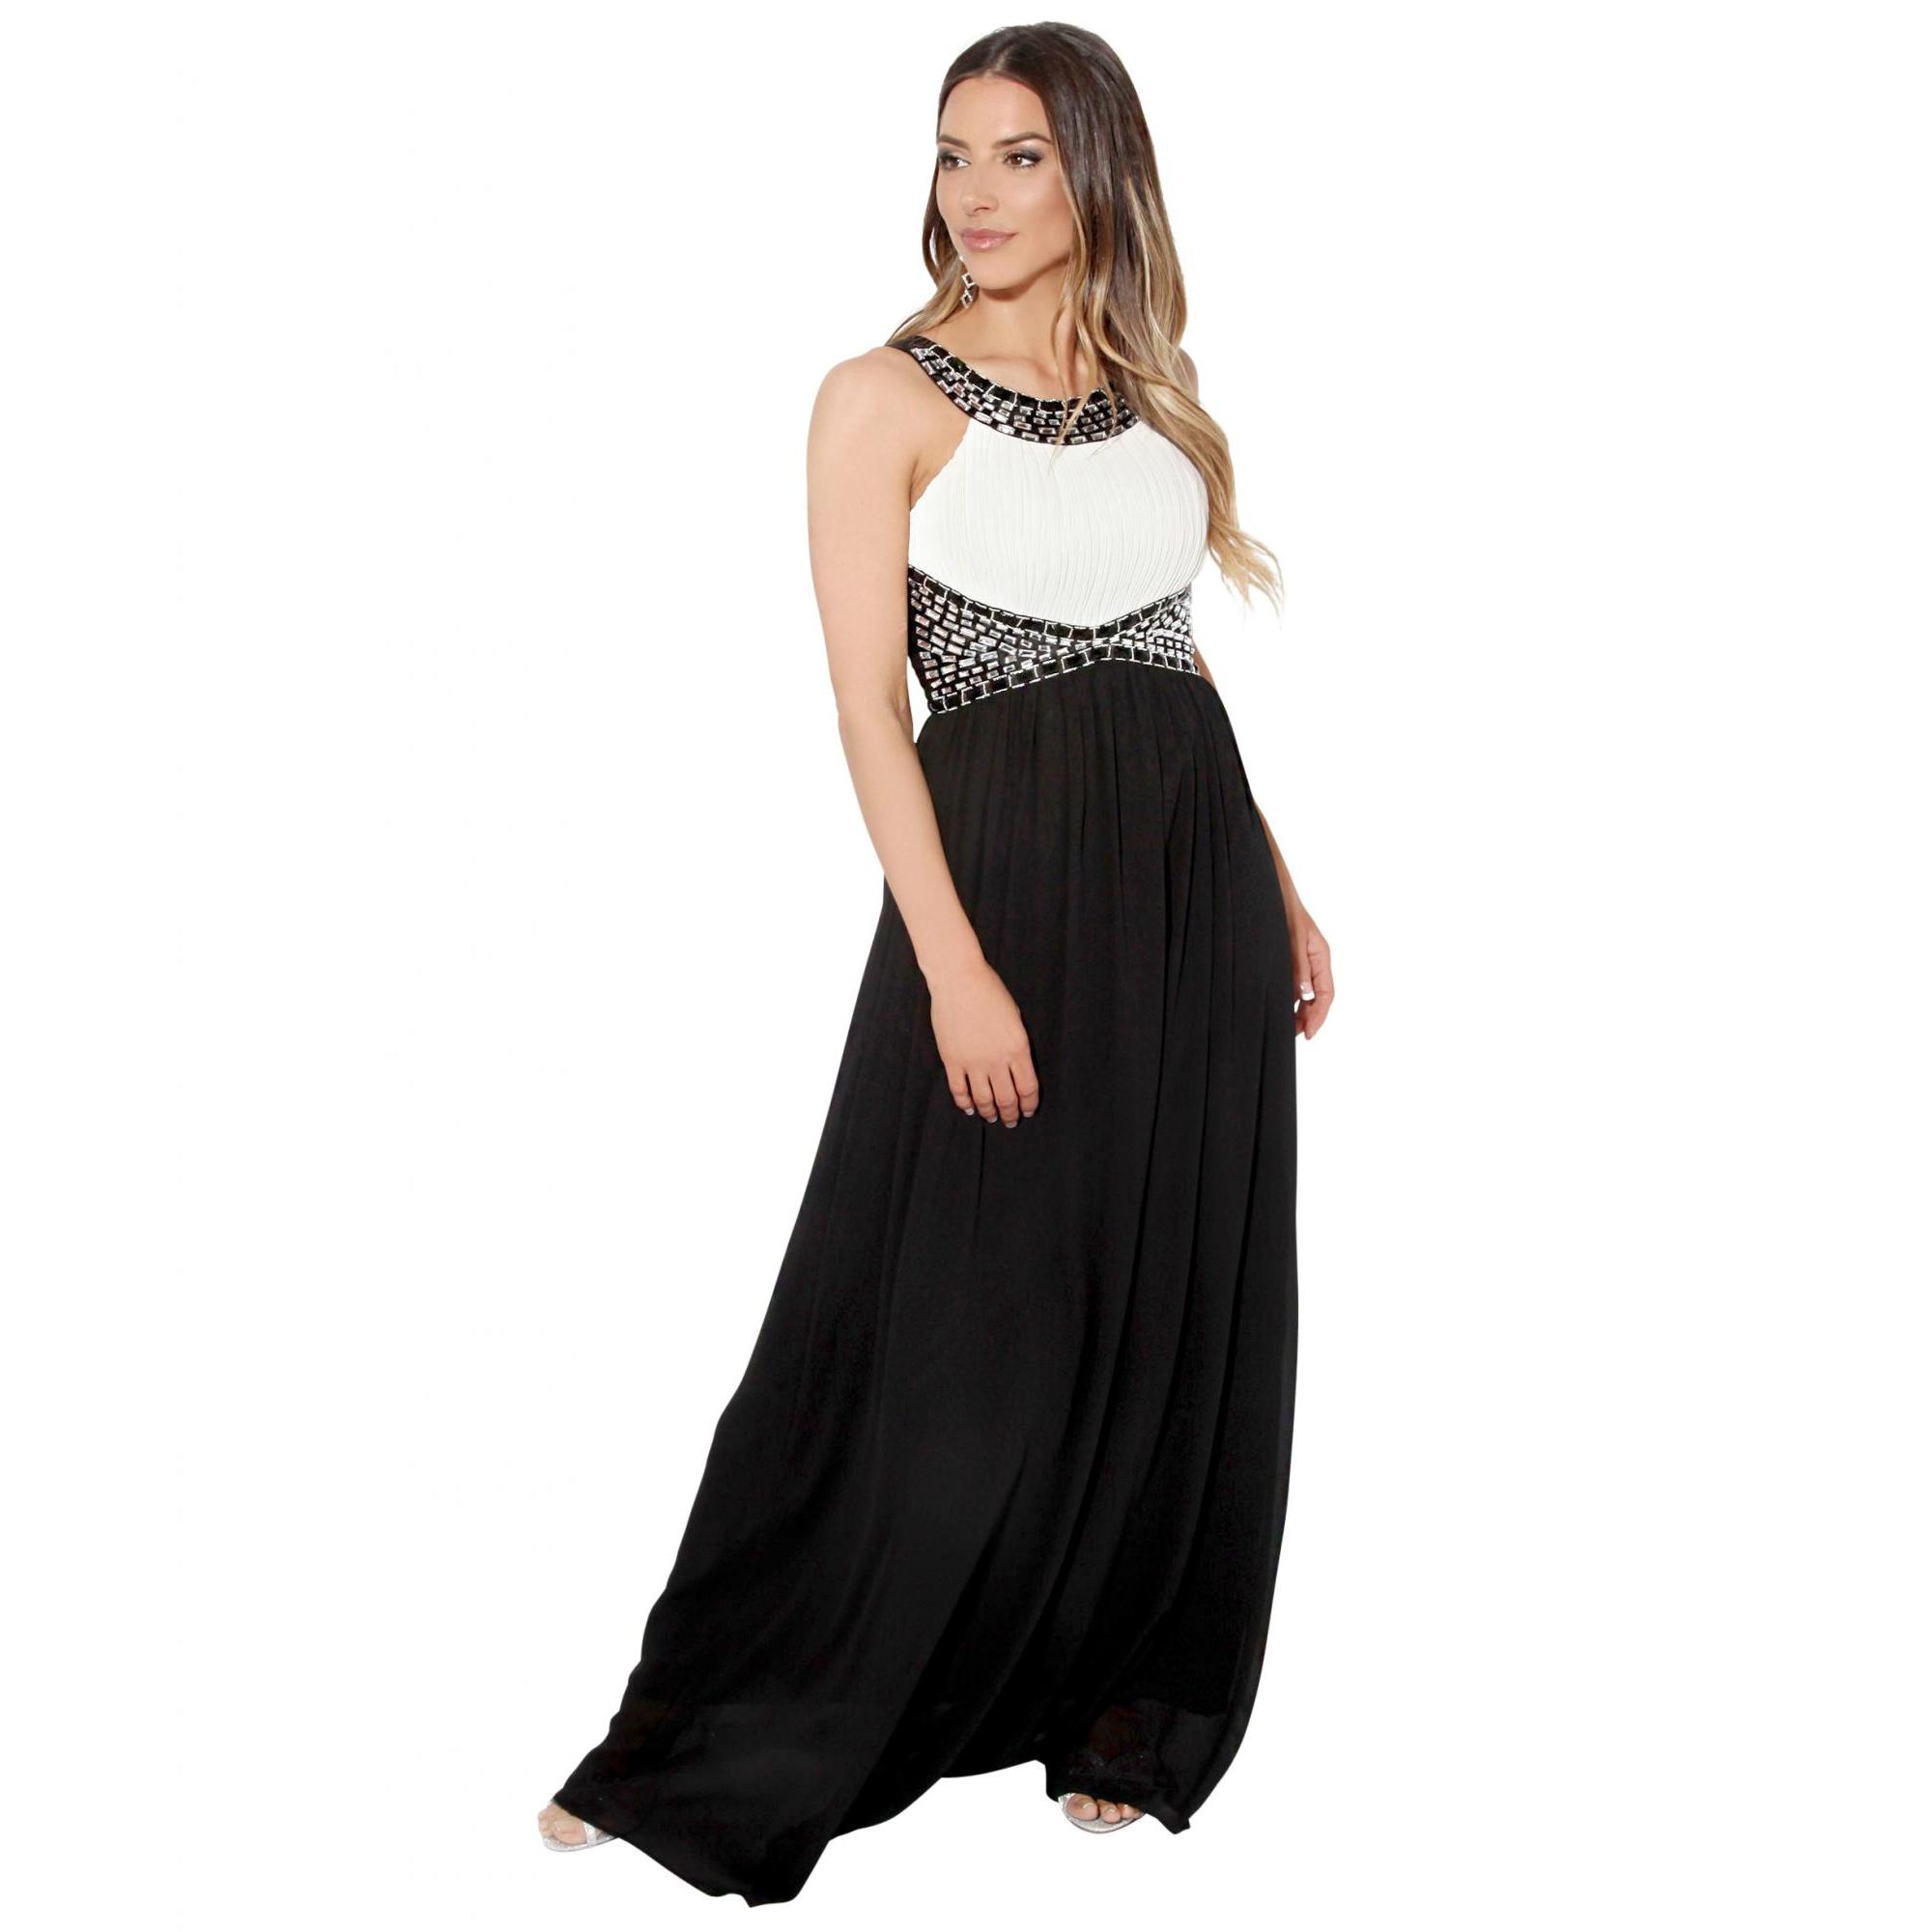 Krisp Womens/Ladies Contrast Diamante Evening Maxi Dress (8 UK) (White/Black)